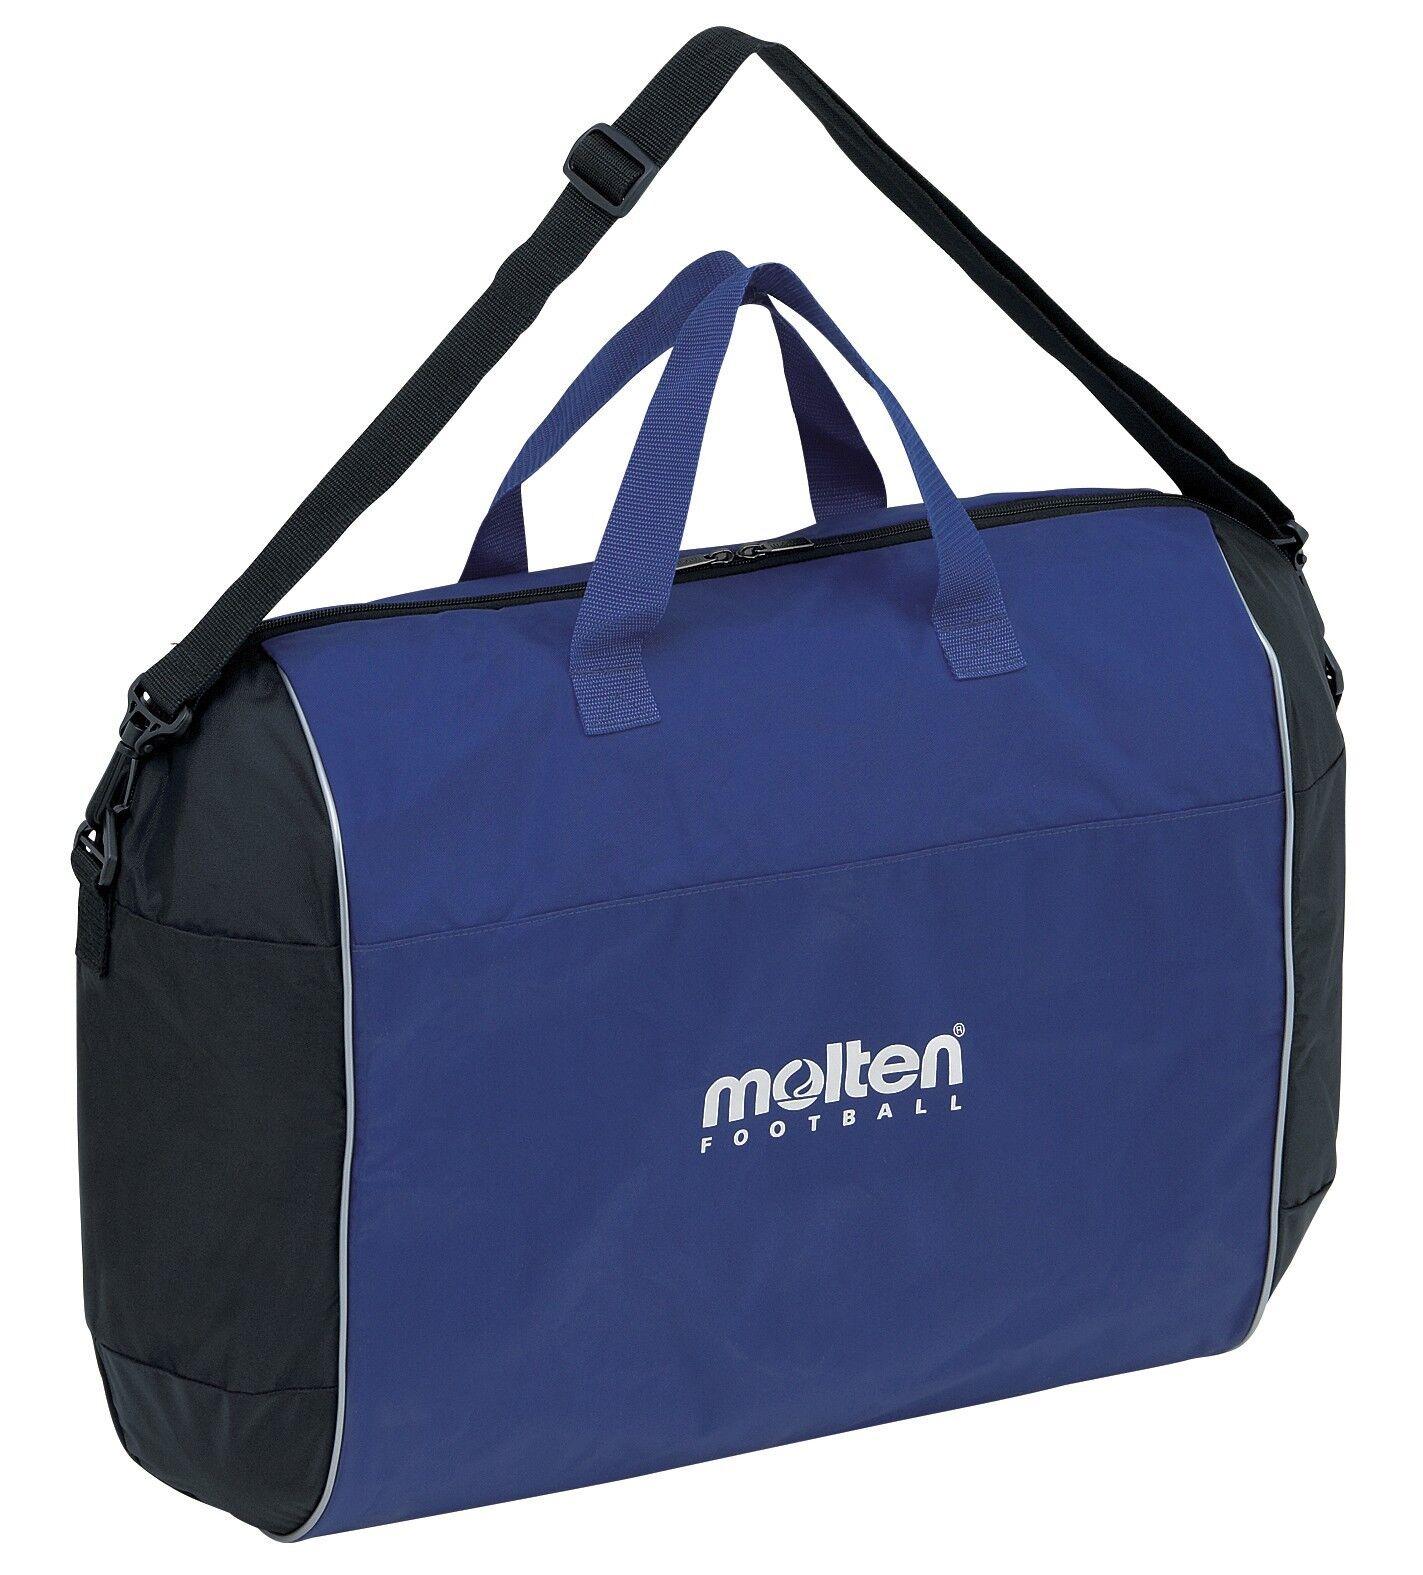 Molten FBAG6 Large 6 Ball Capacity Sports Football Basketball Carrying Bag